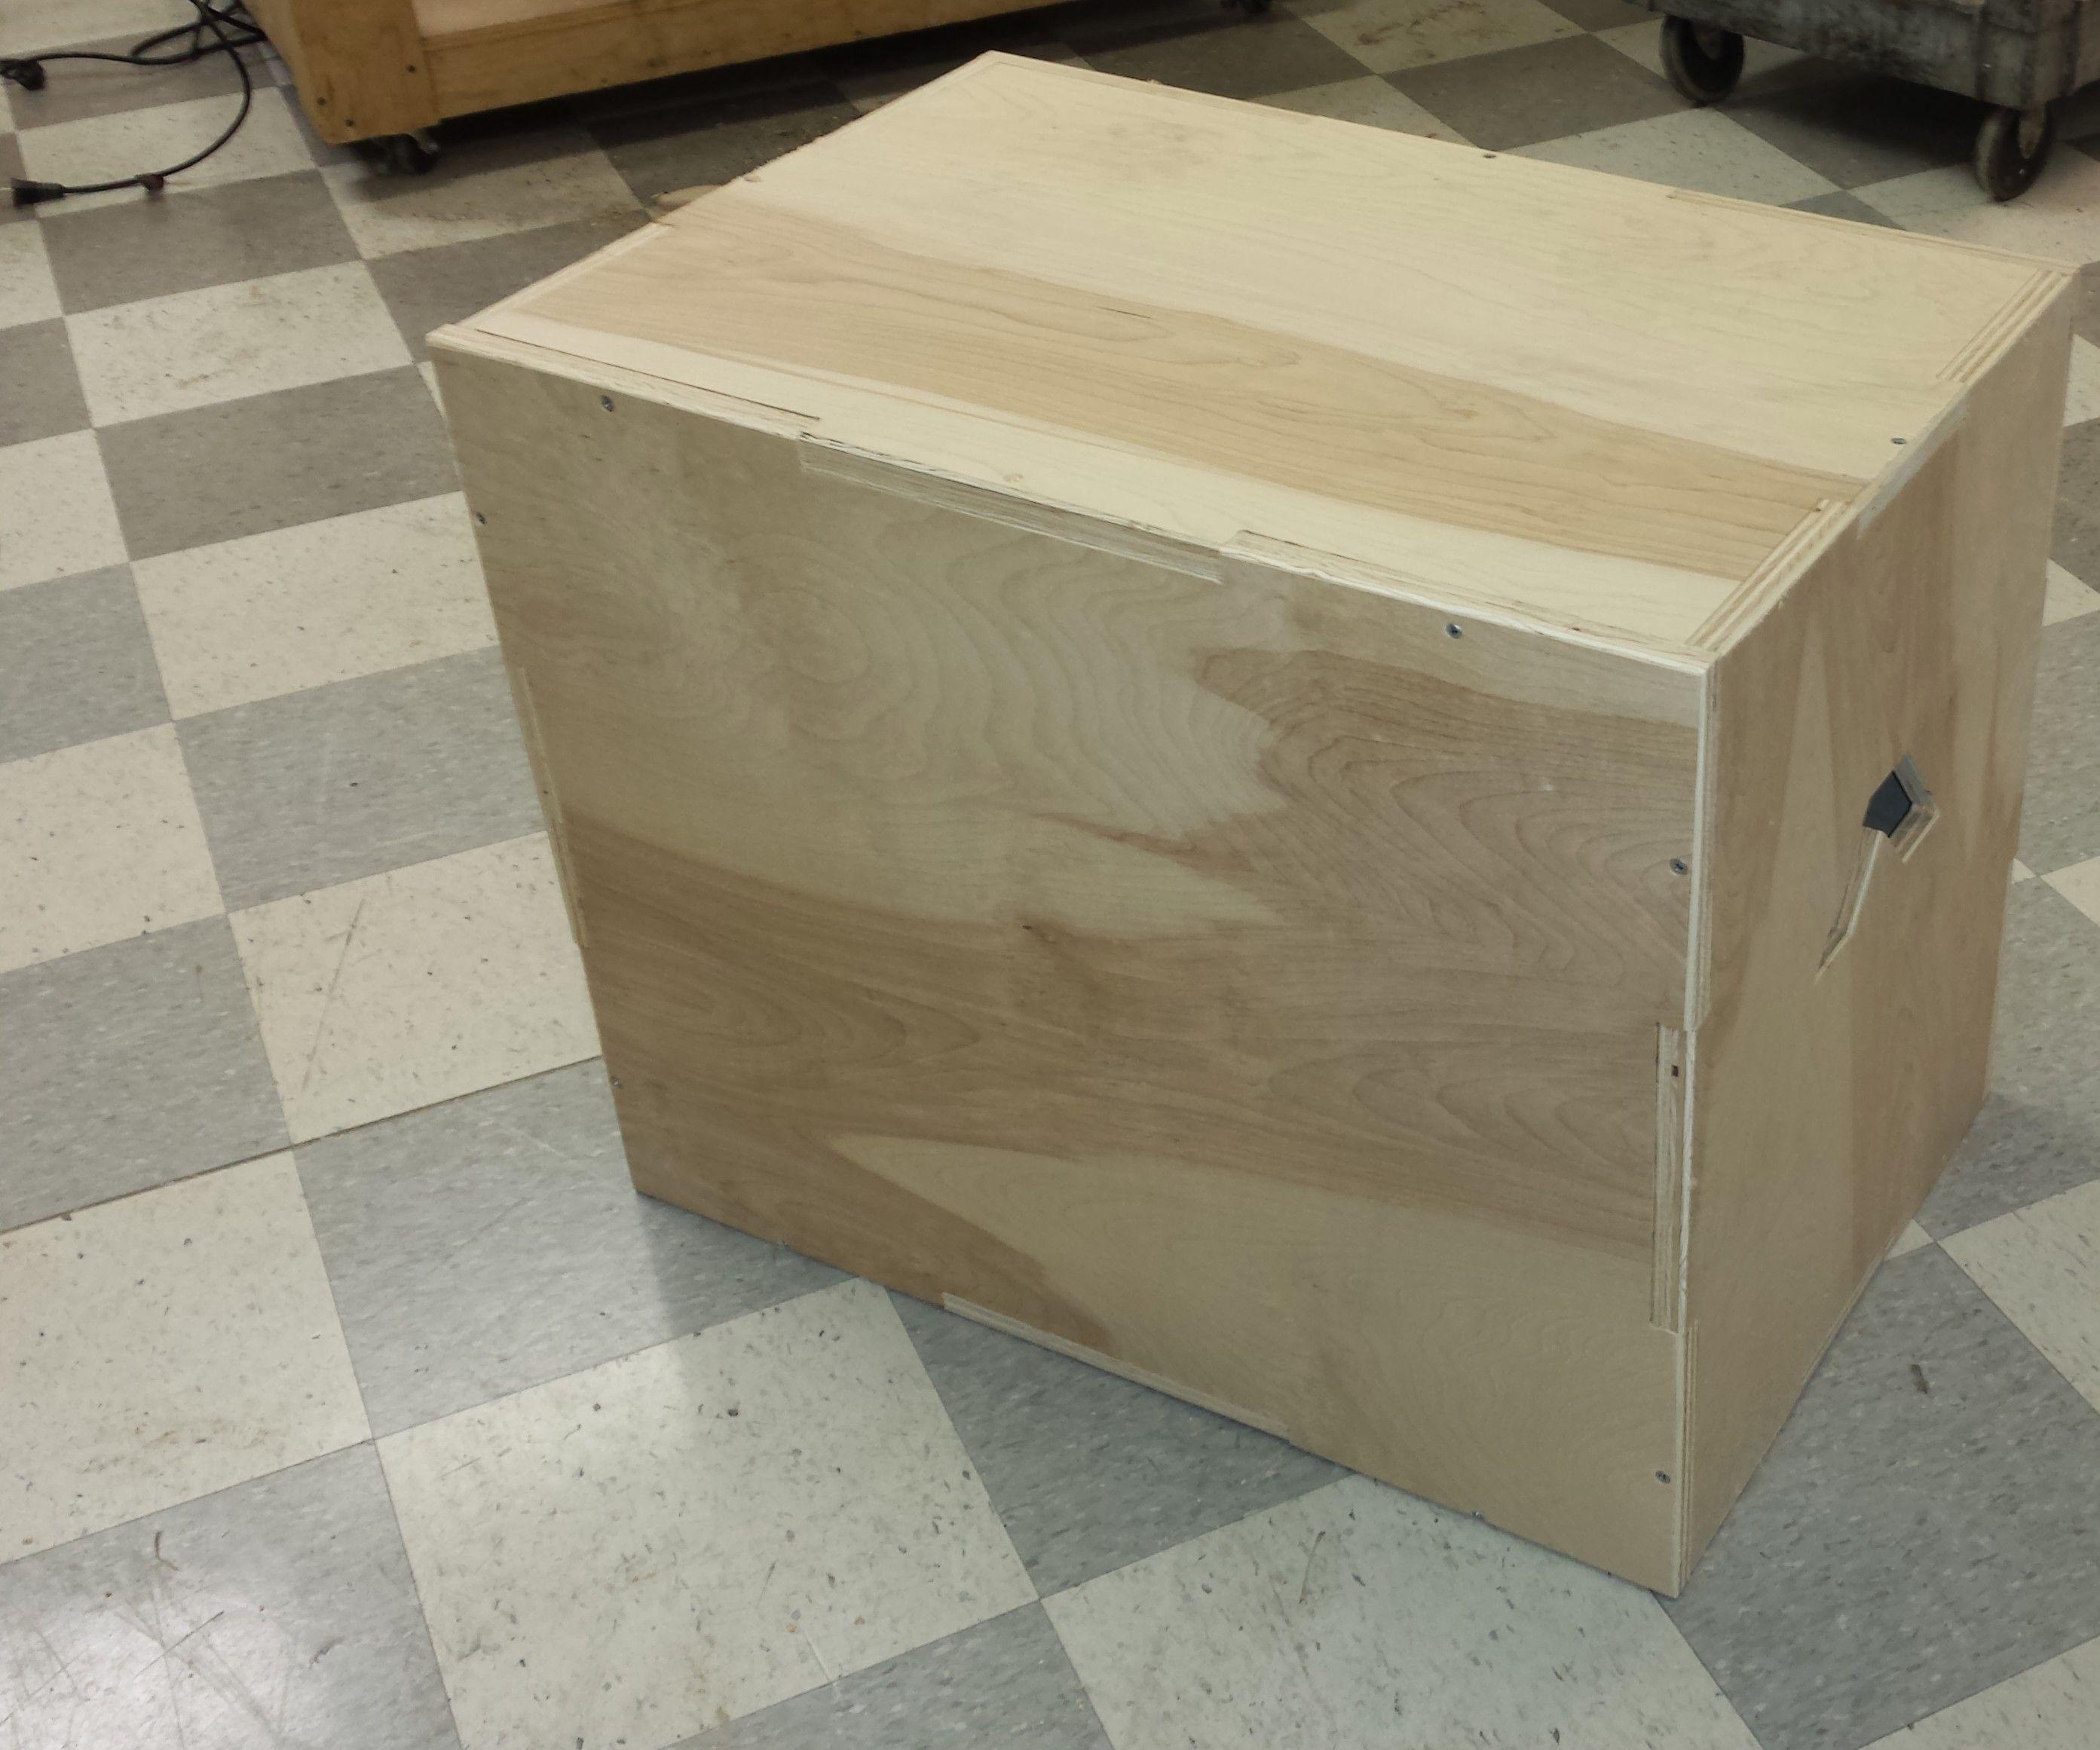 CrossFit Style Plyo Box (ShopBot!)